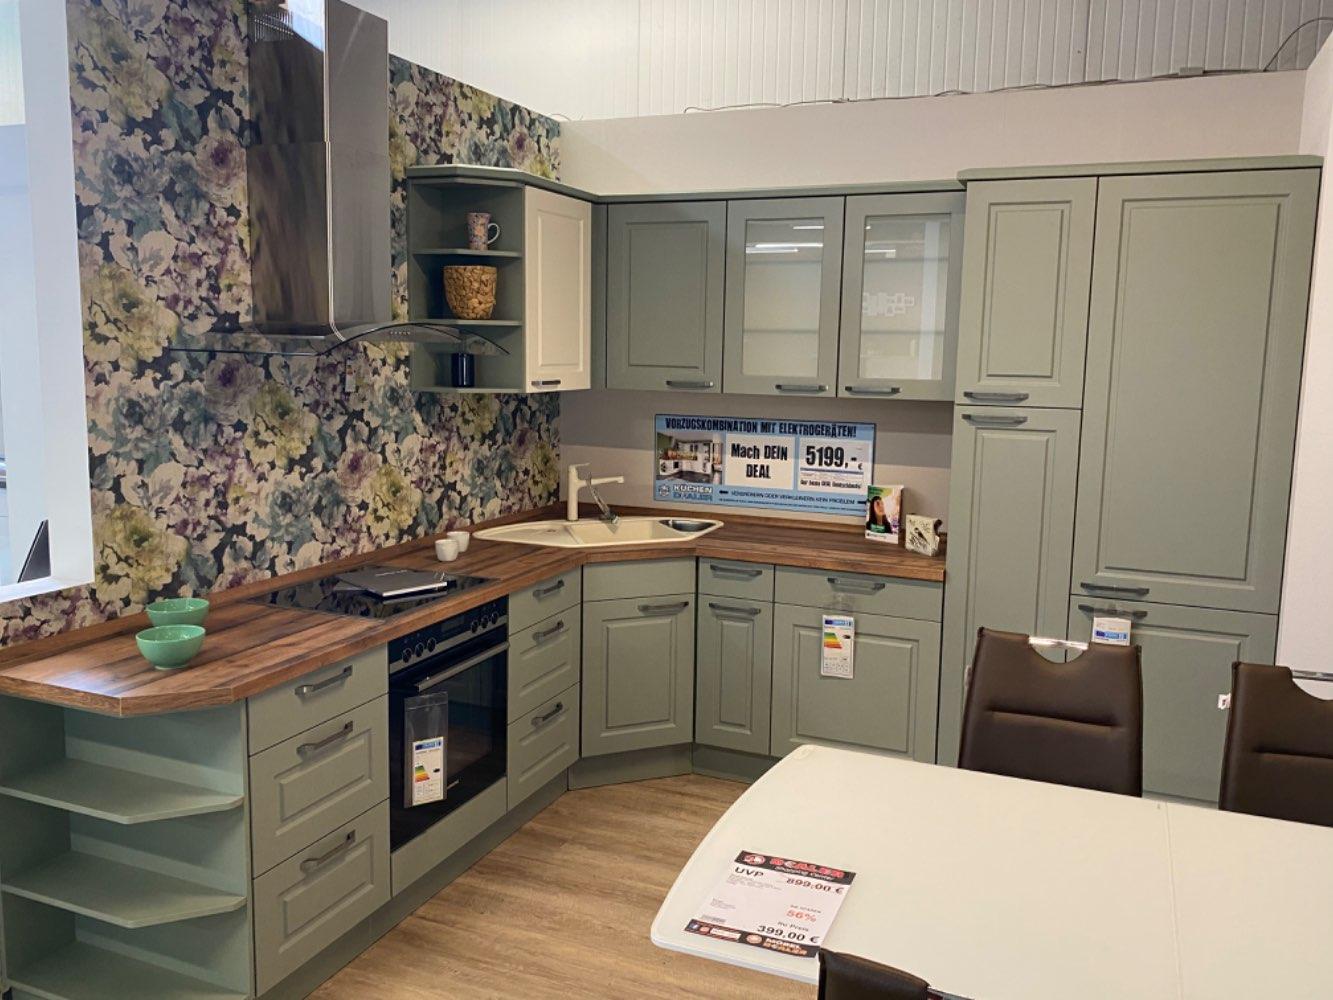 Einbauküche Andalusit / Küche mit E-Geräten Top Deal Koje 22